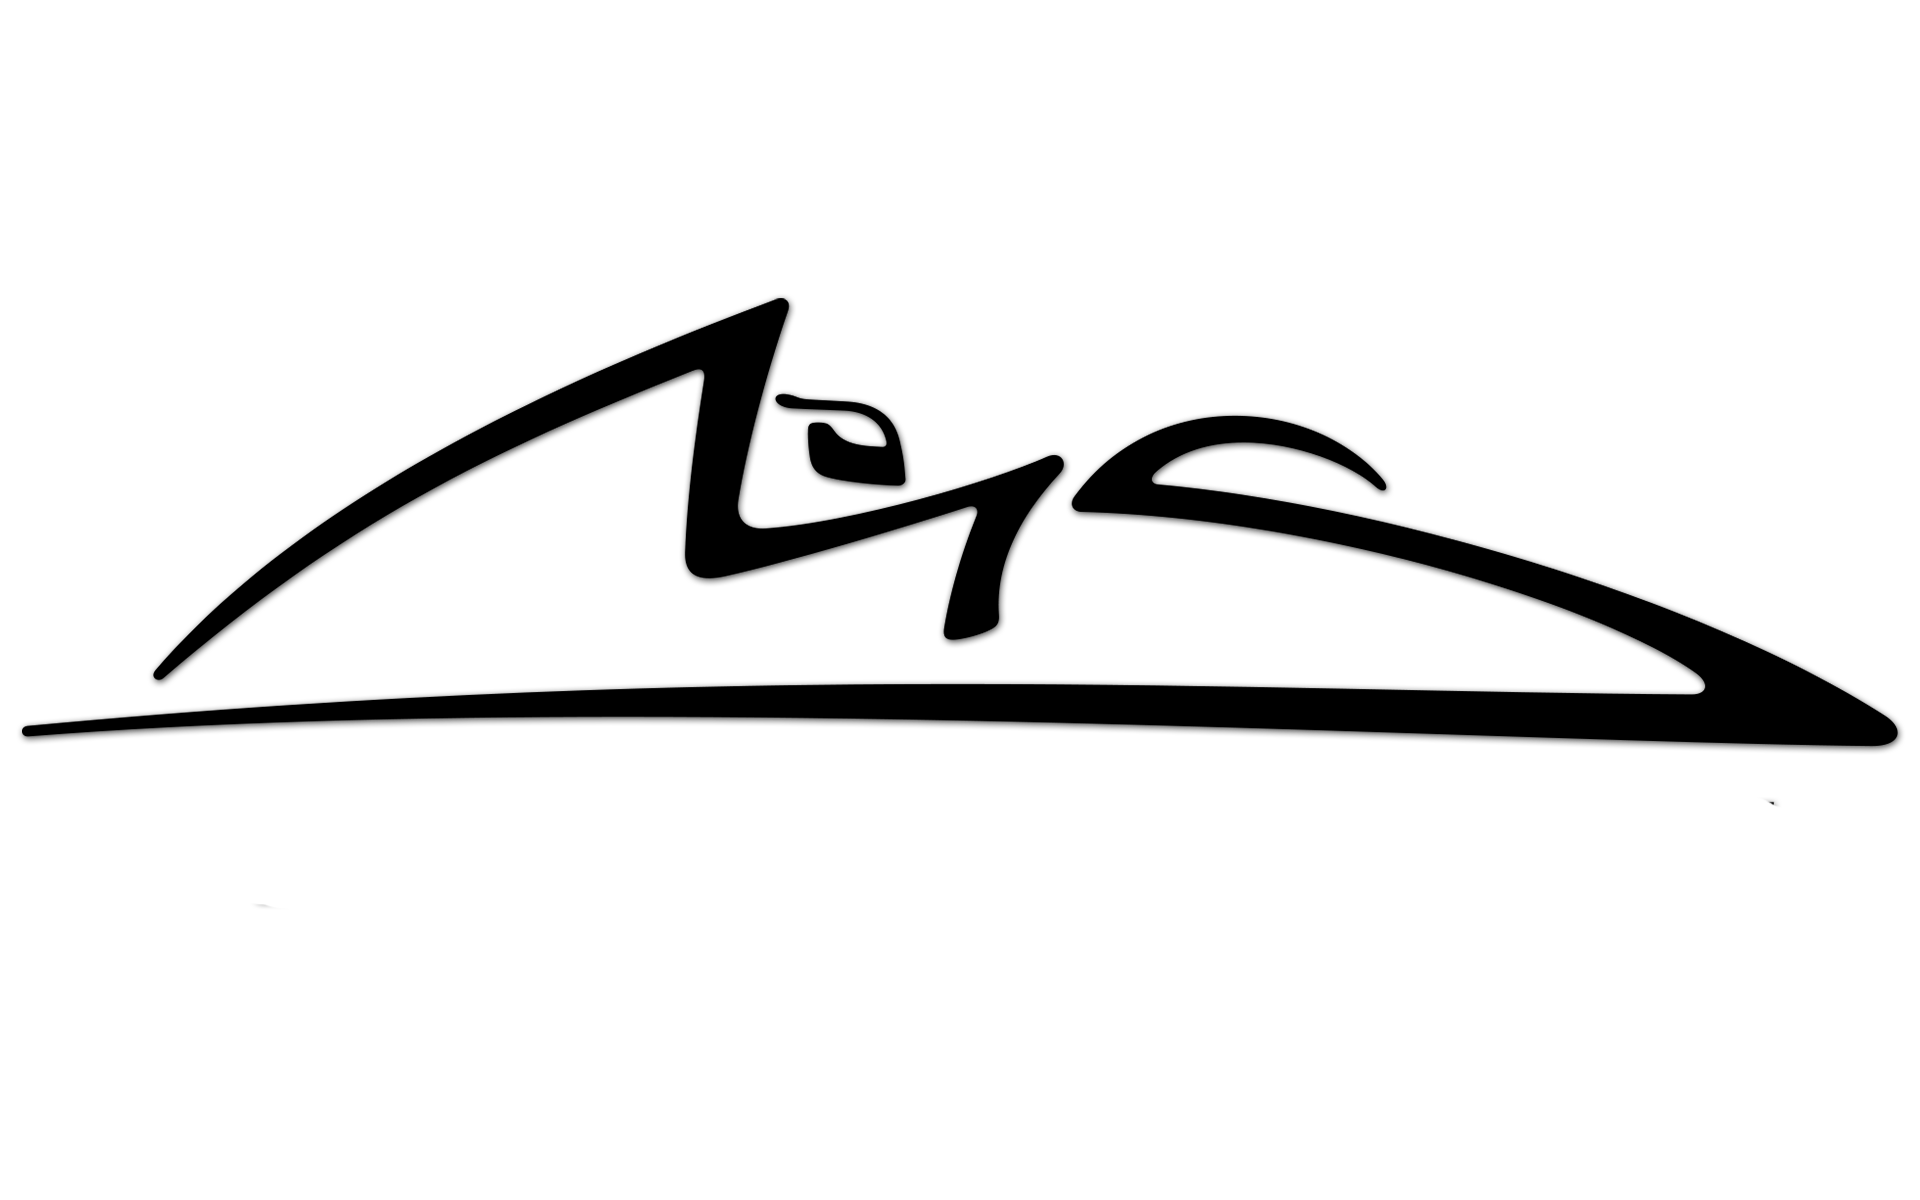 d9x4pat-922613f7-3b9c-4c3f-b335-cc70cf921ac4.png